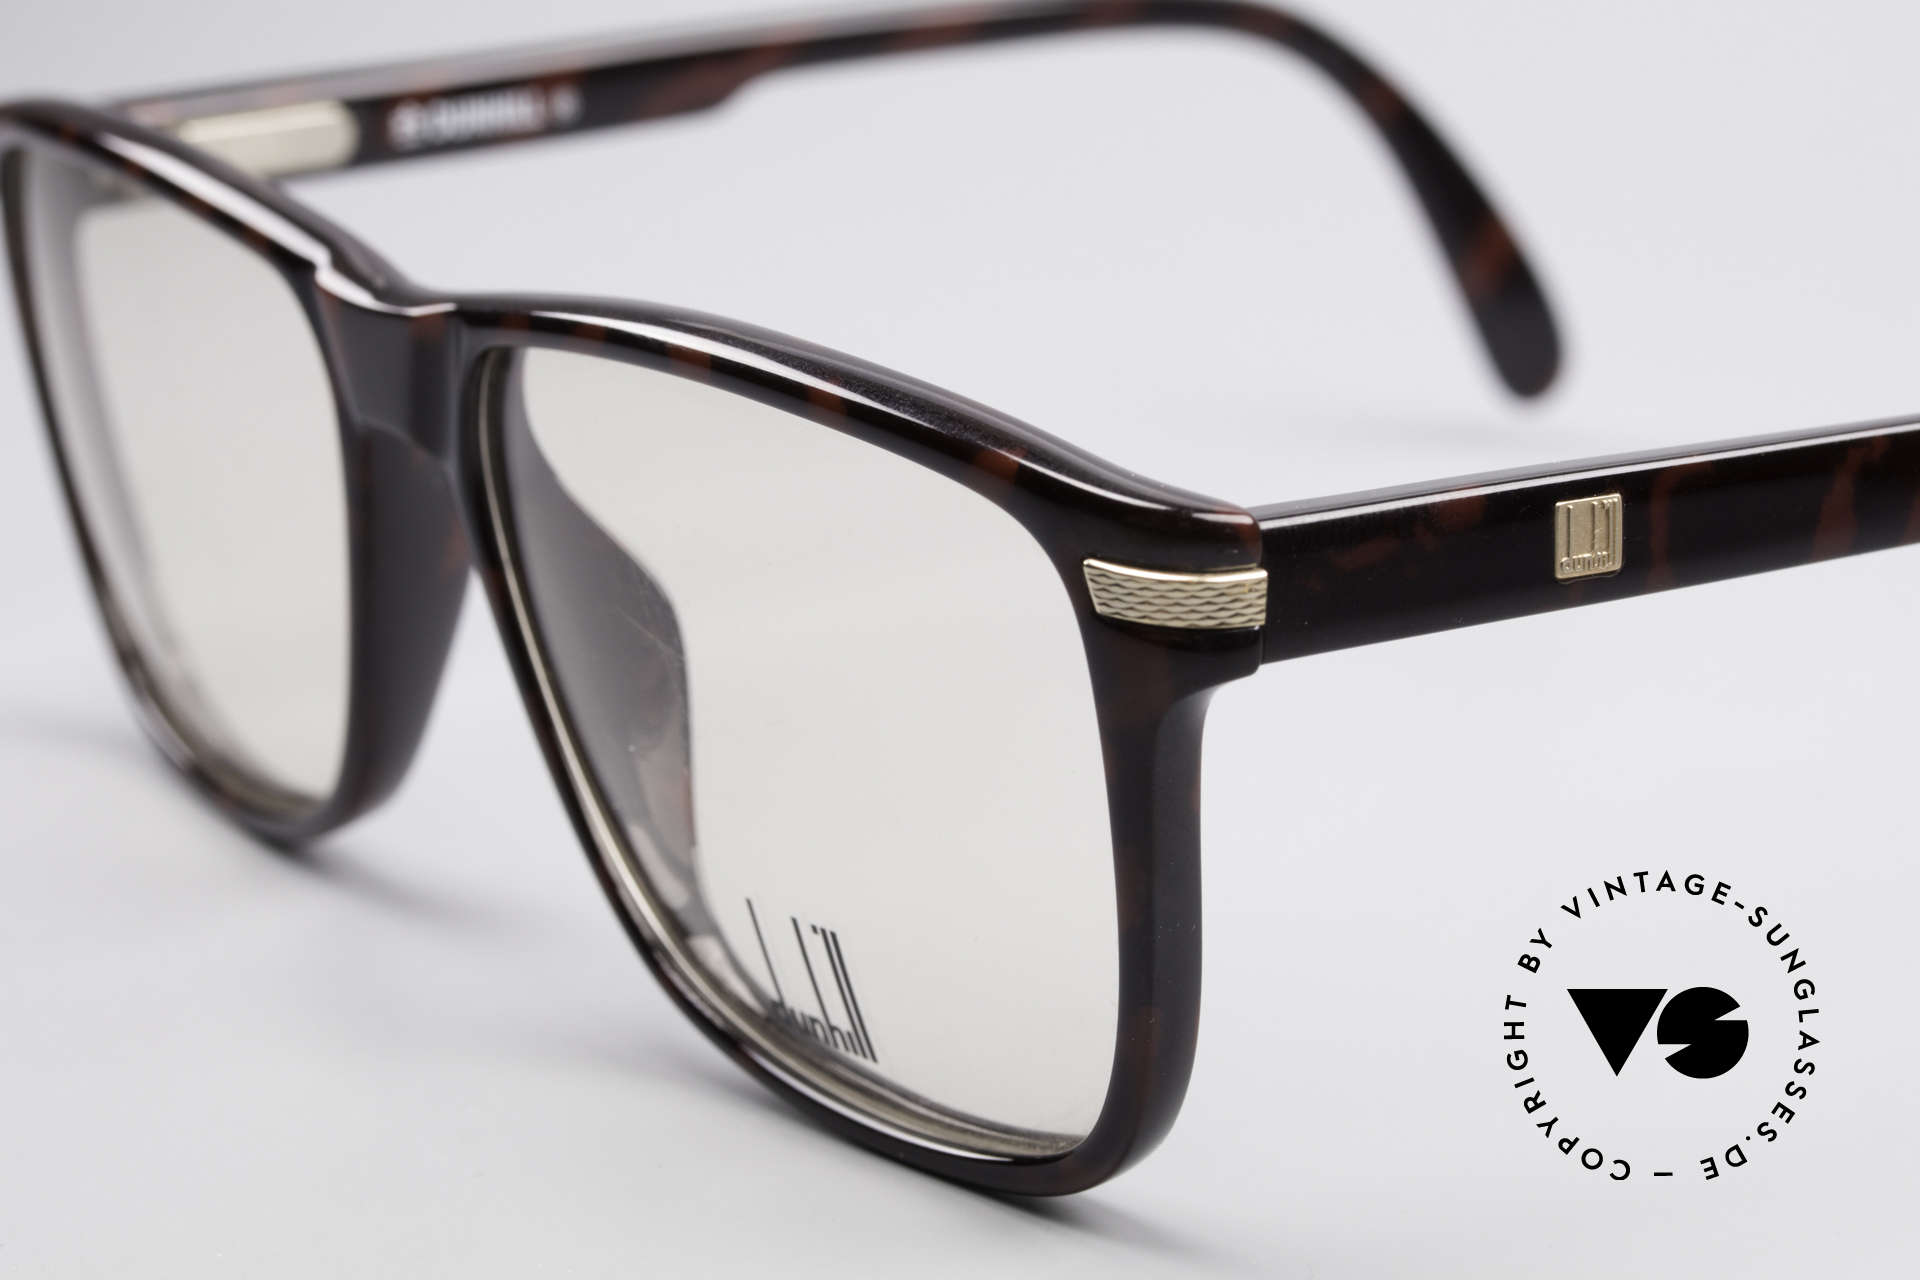 Dunhill 6055 Johnny Depp Nerd Style Frame, unworn (like all our vintage Dunhill 80s glasses), Made for Men